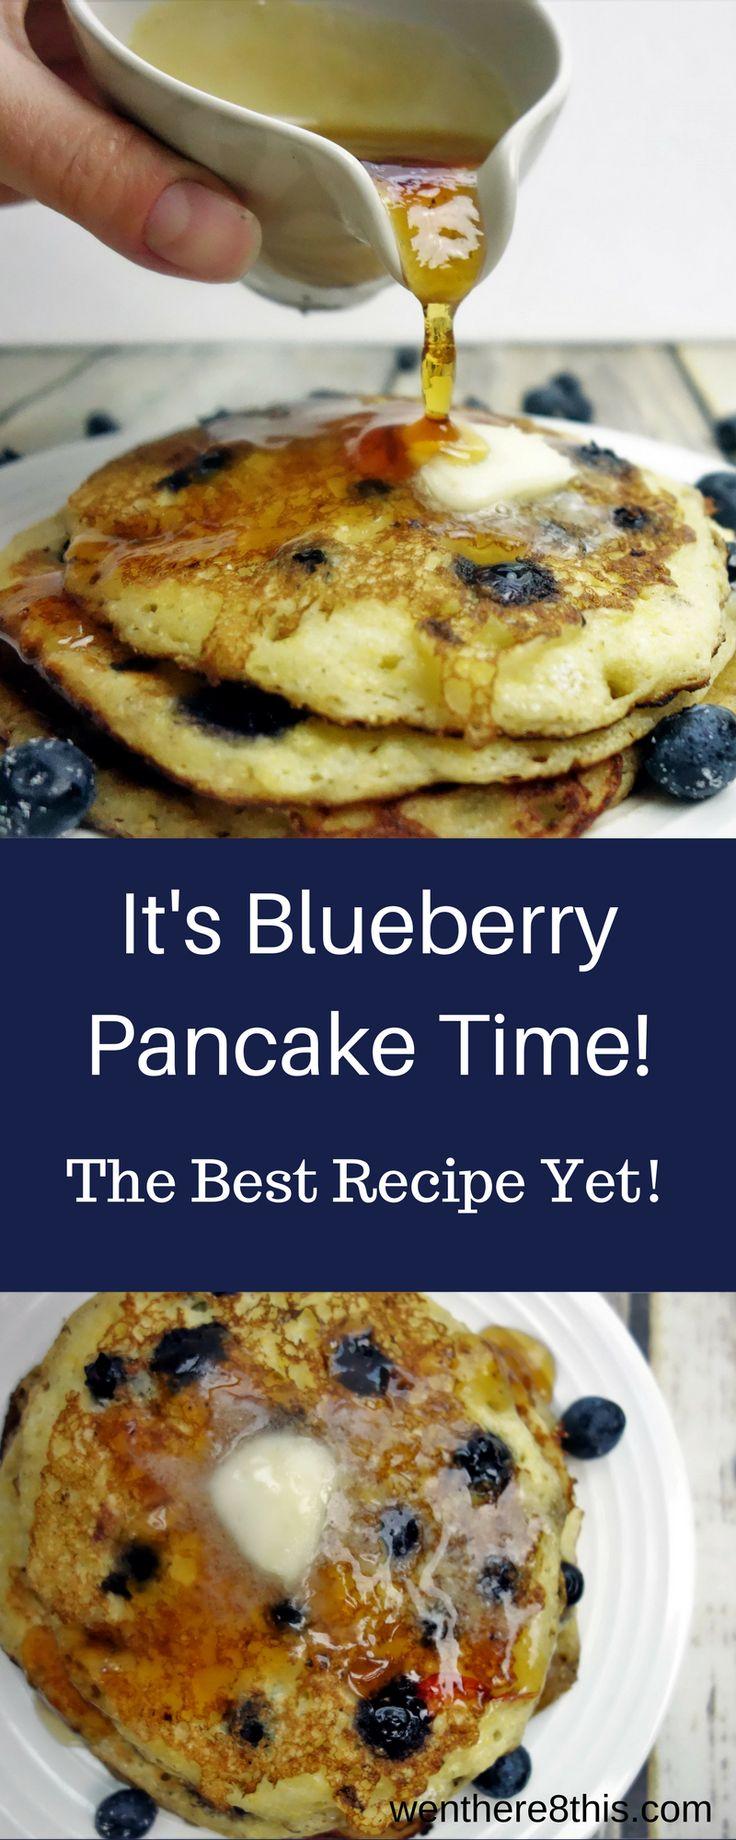 Delicious Blueberry Cornmeal Pancakes with Lemon Syrup blueberry pancakes easy, blueberry pancakes recipe, best blueberry pancakes, pancakes recipe, breakfast recipe, lemon syrup recipe, fresh lemon syrup, blueberry and lemon, corn meal pancakes, cornmeal blueberry pancakes, blueberry lemon cornmeal pancakes